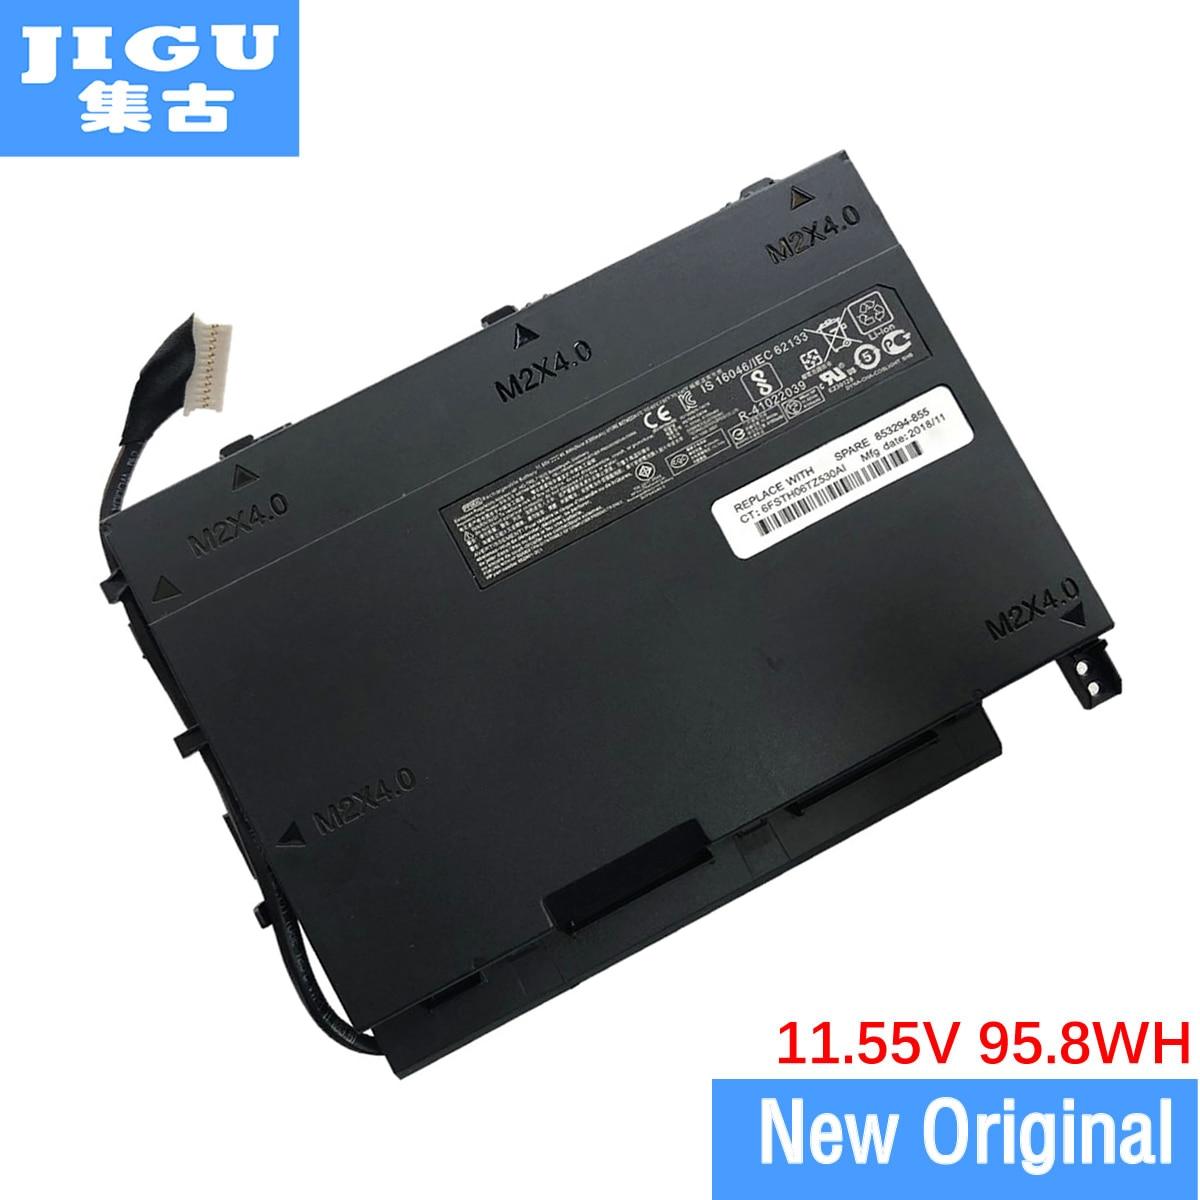 JIGU For HP 852801-2C1 PF06XL HSTNN-DB7M Original Laptop Battery For Omen 17-w100 17-204TX 17t-w200 11.55V 95.8WH